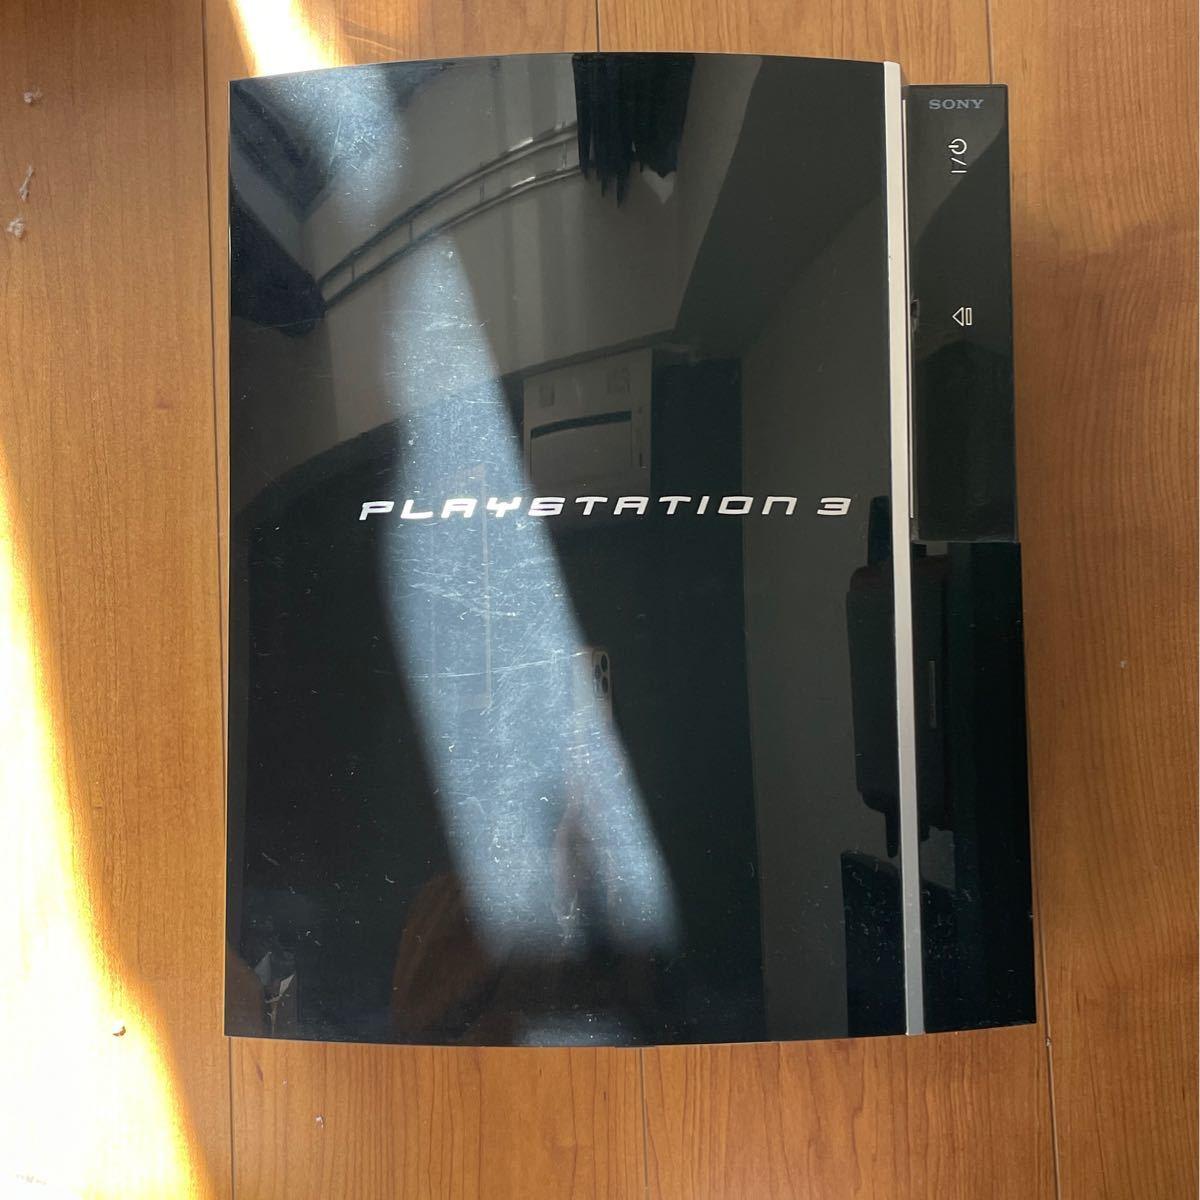 SONY PS3本体 PlayStation3 プレイステーション3 ソニー CECHL00 初期型